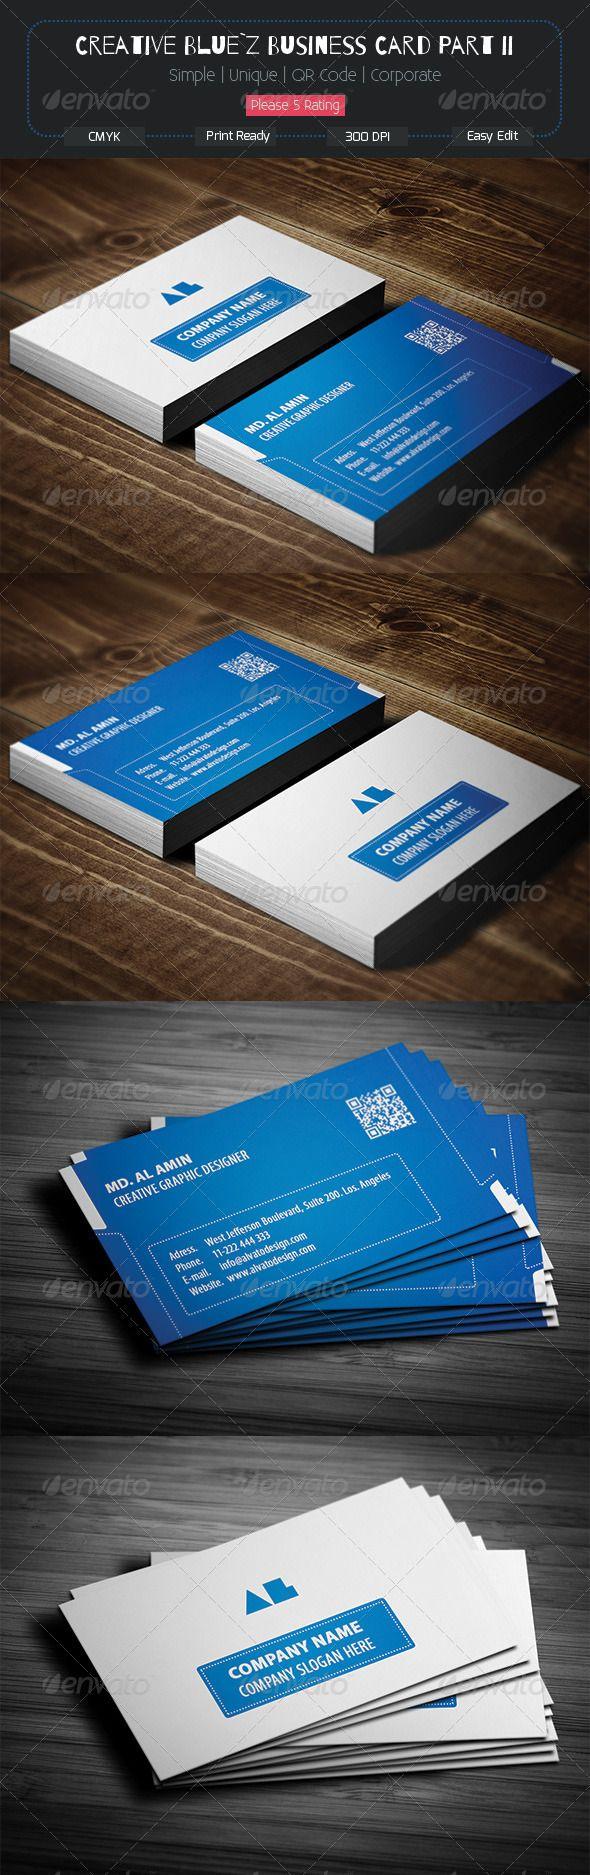 Creative Blue Z Business Card Part Ii Business Cards Creative Templates Letterpress Business Cards Business Cards Creative